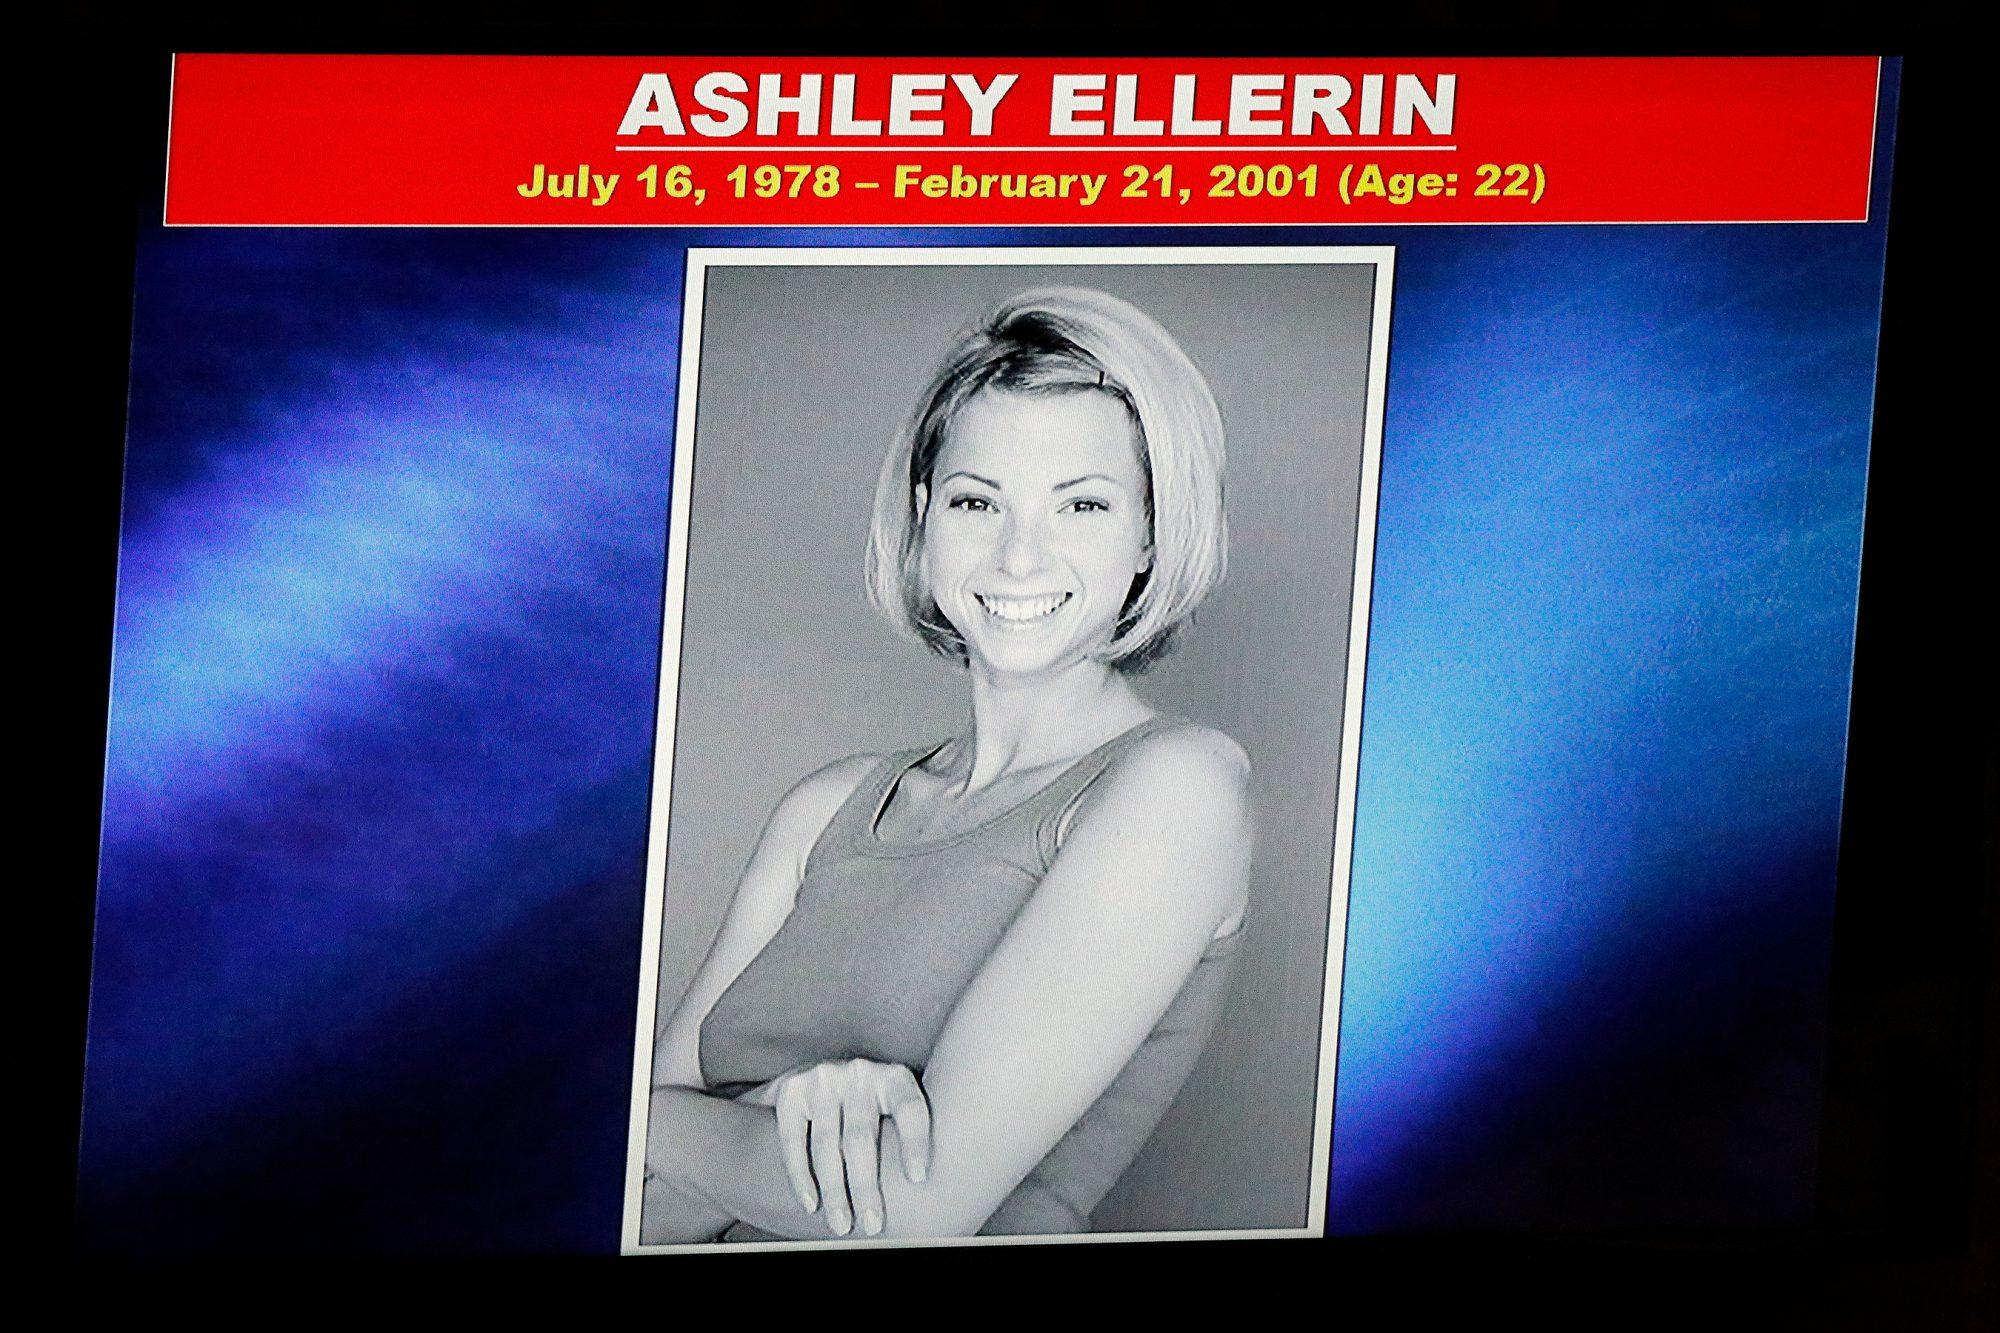 Ashley Ellerin